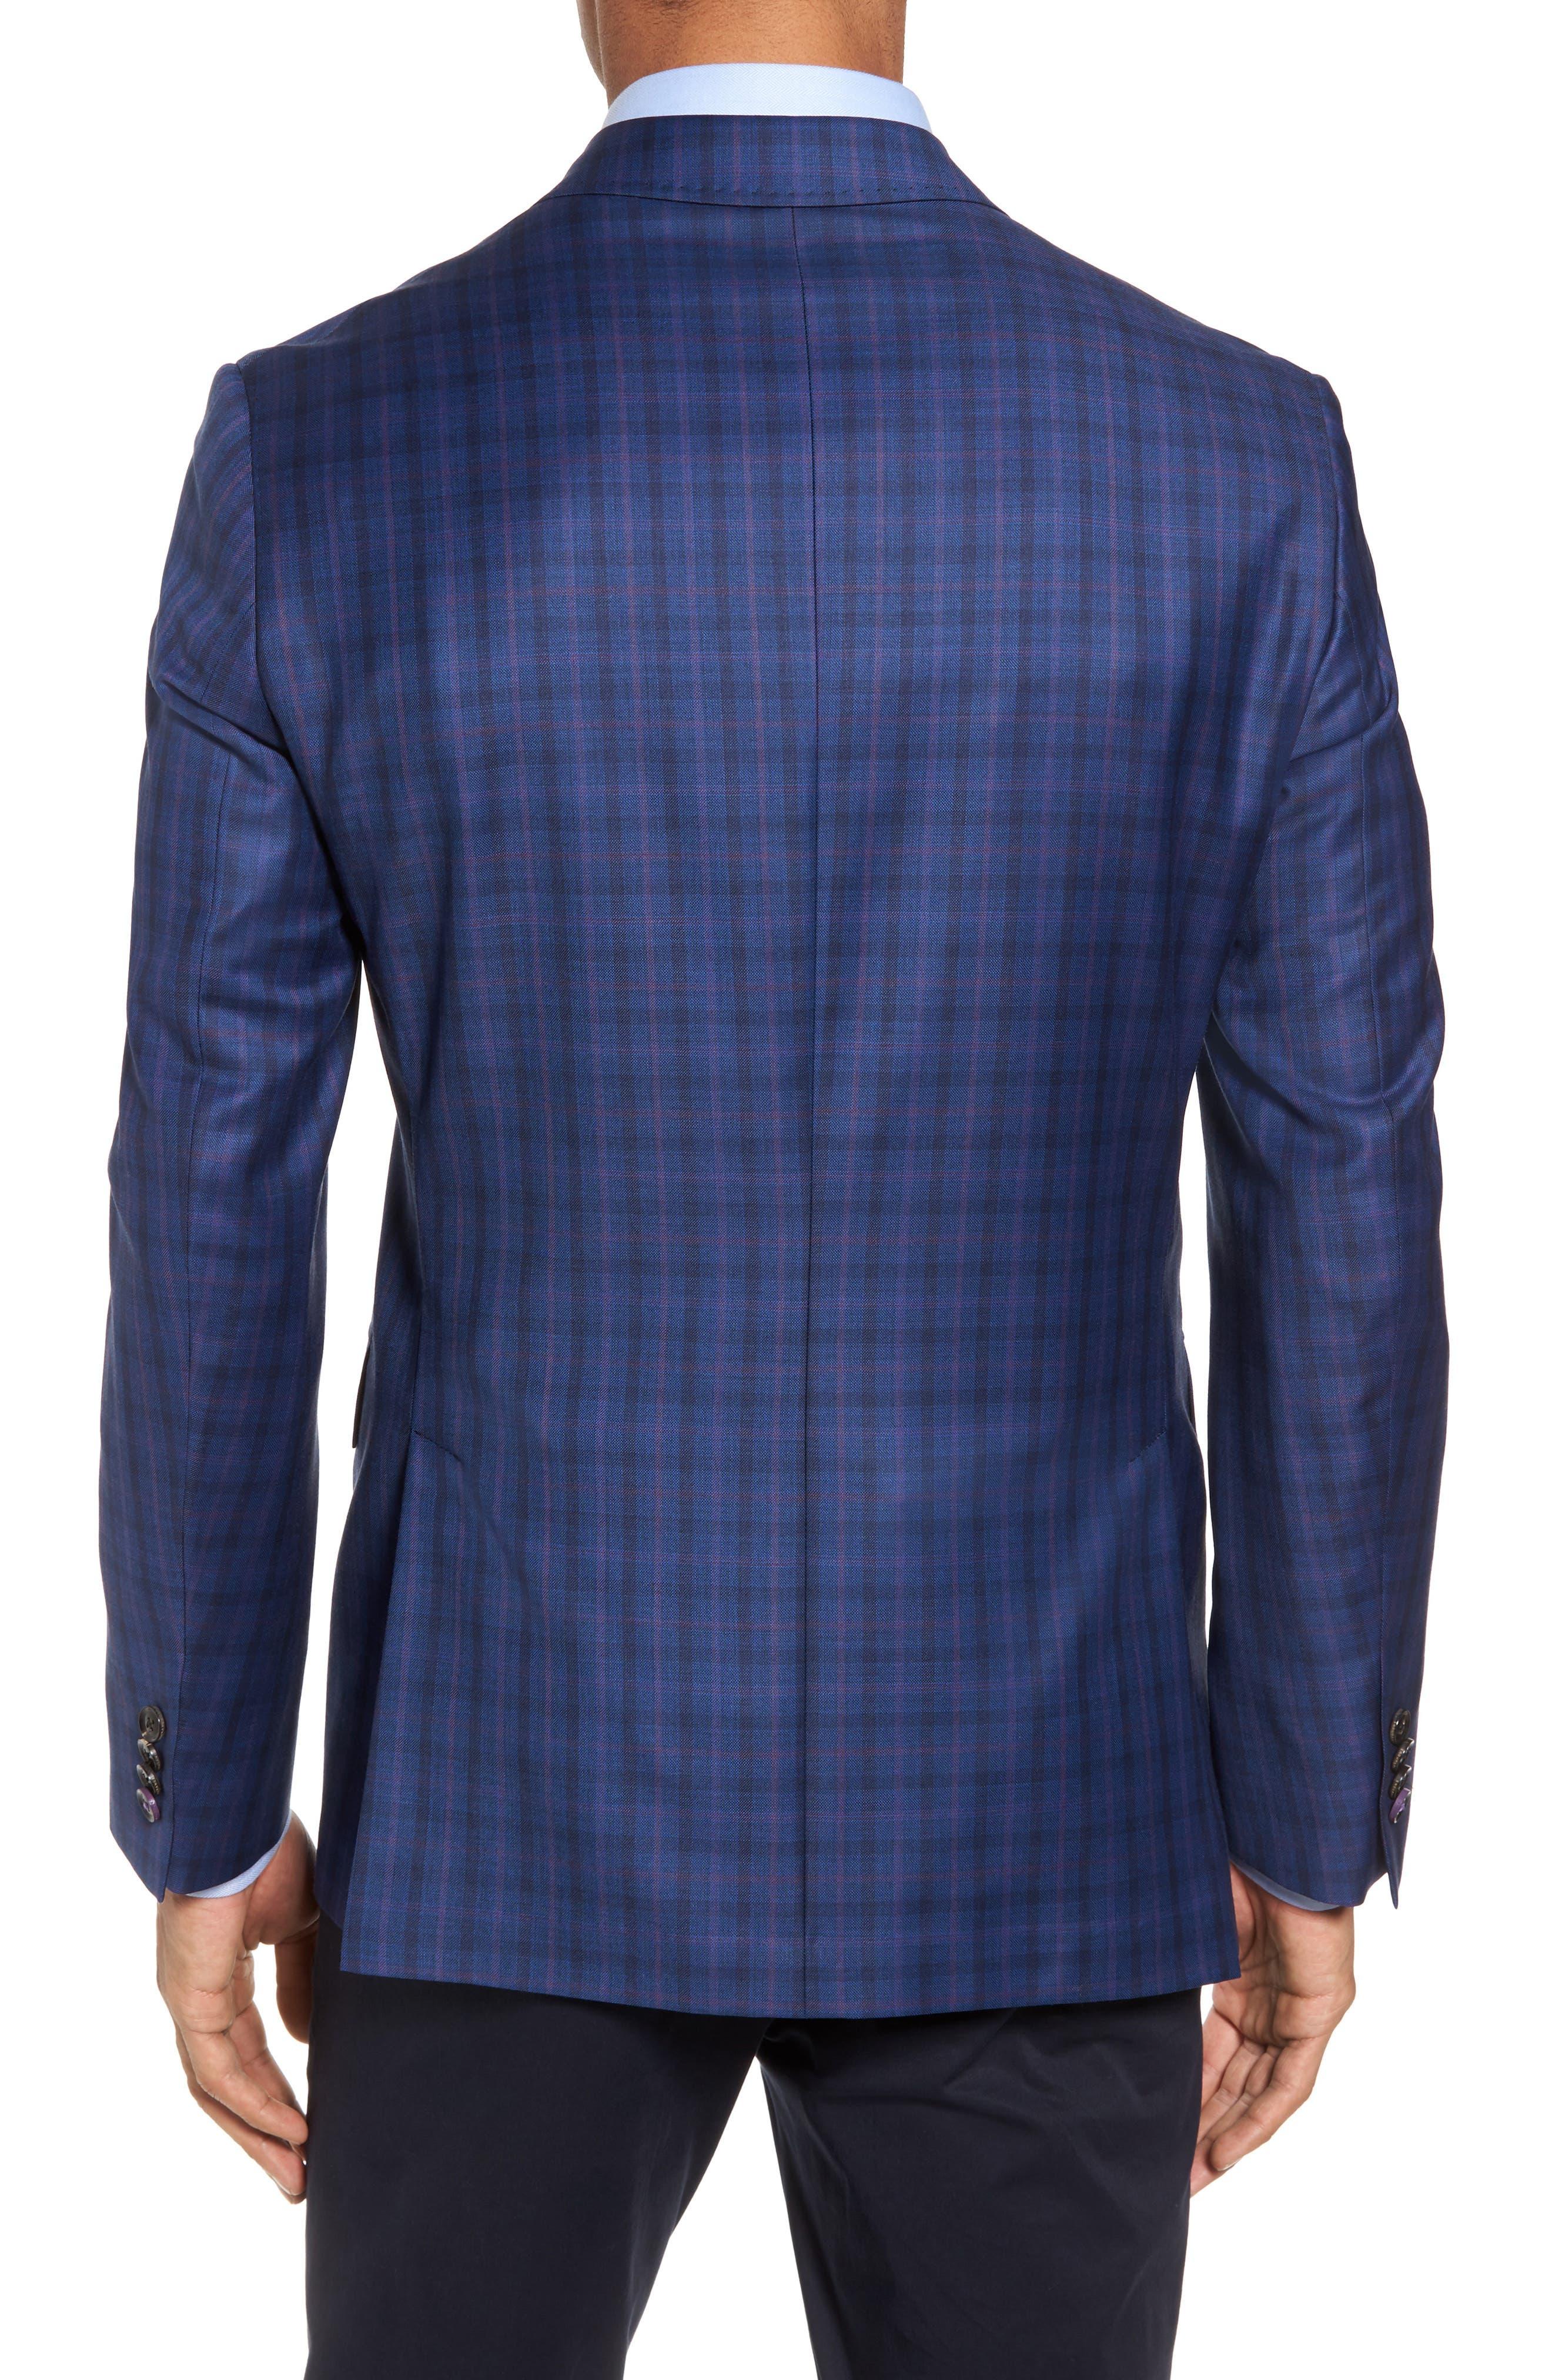 Konan Trim Fit Plaid Wool Sport Coat,                             Alternate thumbnail 2, color,                             400